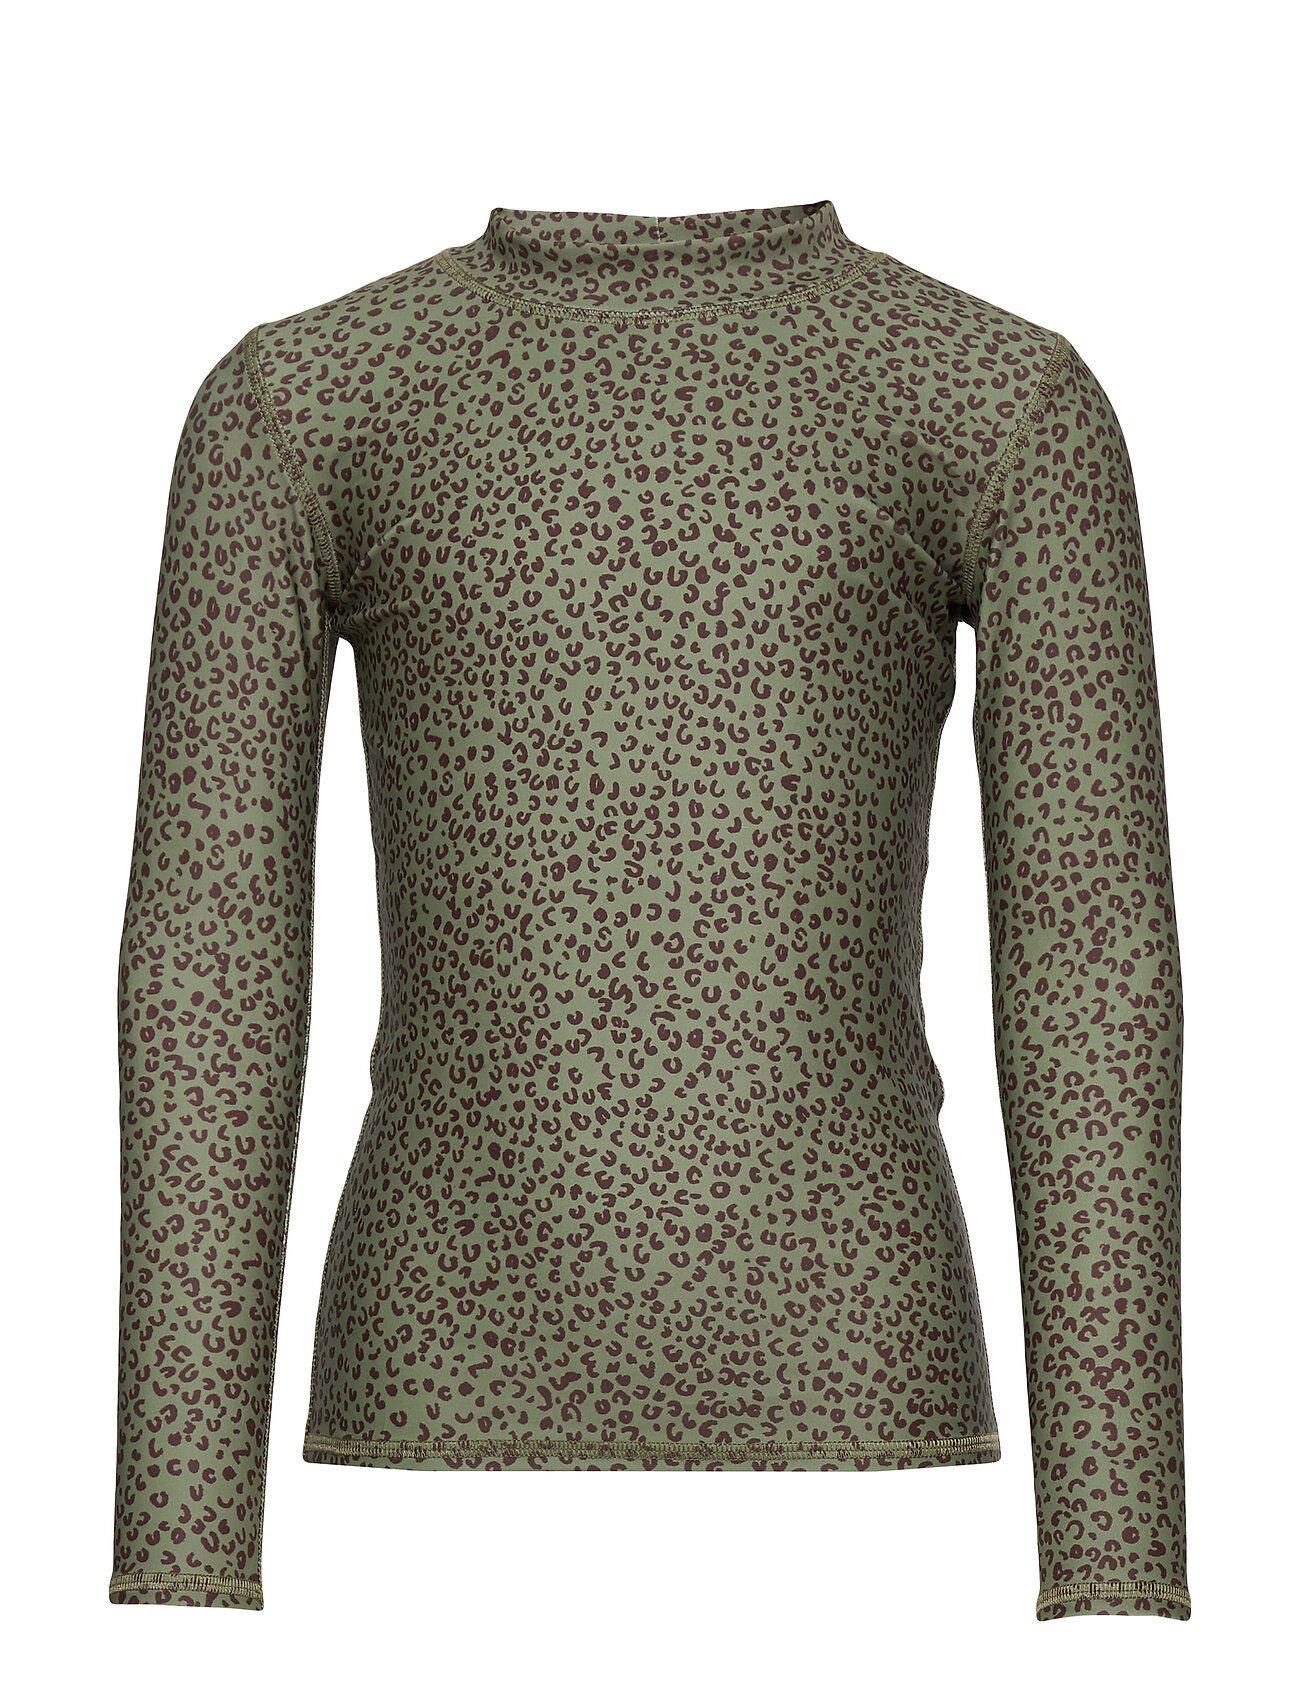 Image of Soft Gallery Astin Sun Shirt Swimwear UV Clothing UV Tops Vihreä Soft Gallery